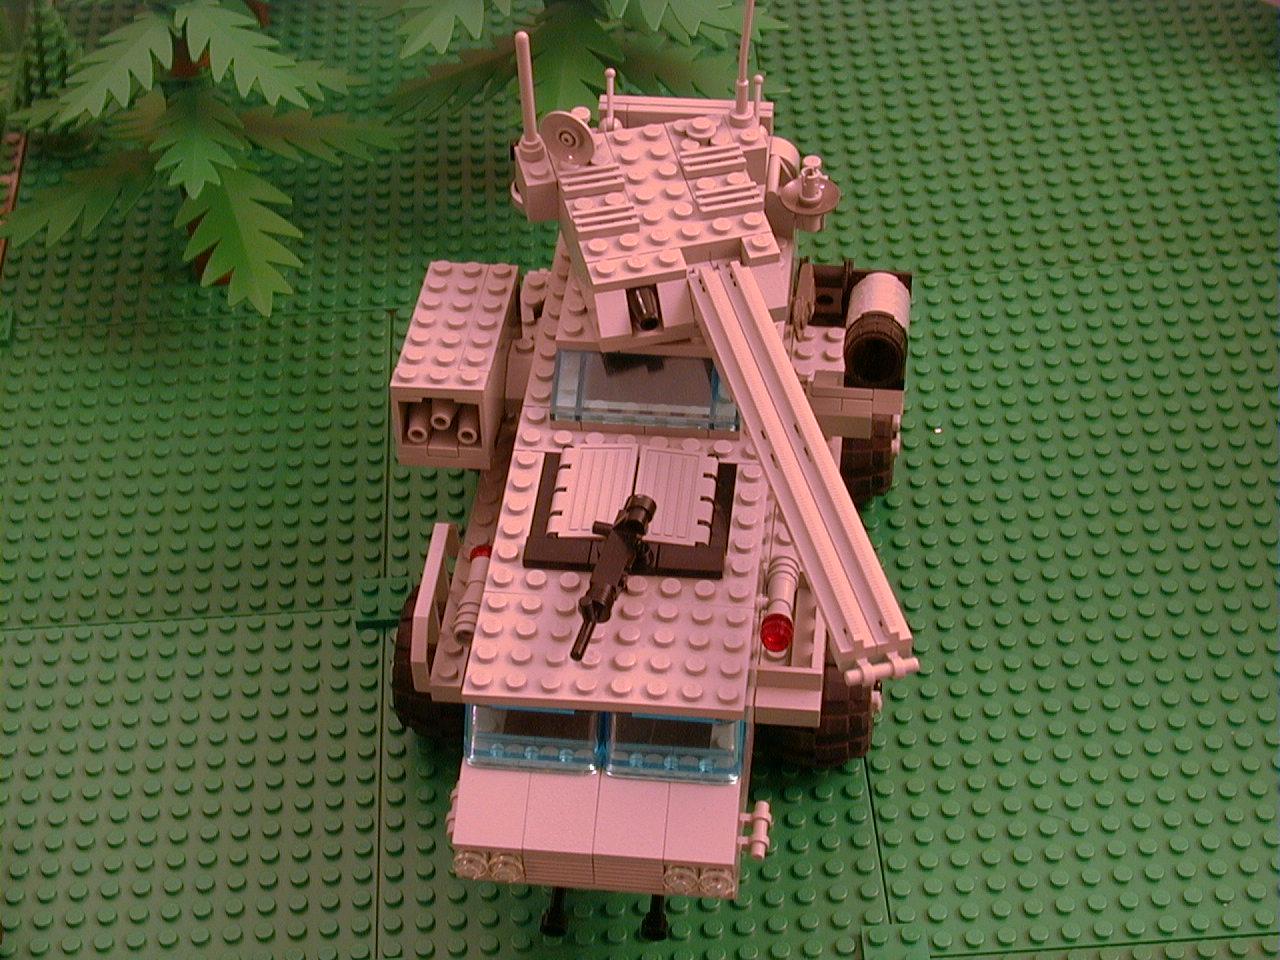 Dobblaski's AAV-20B